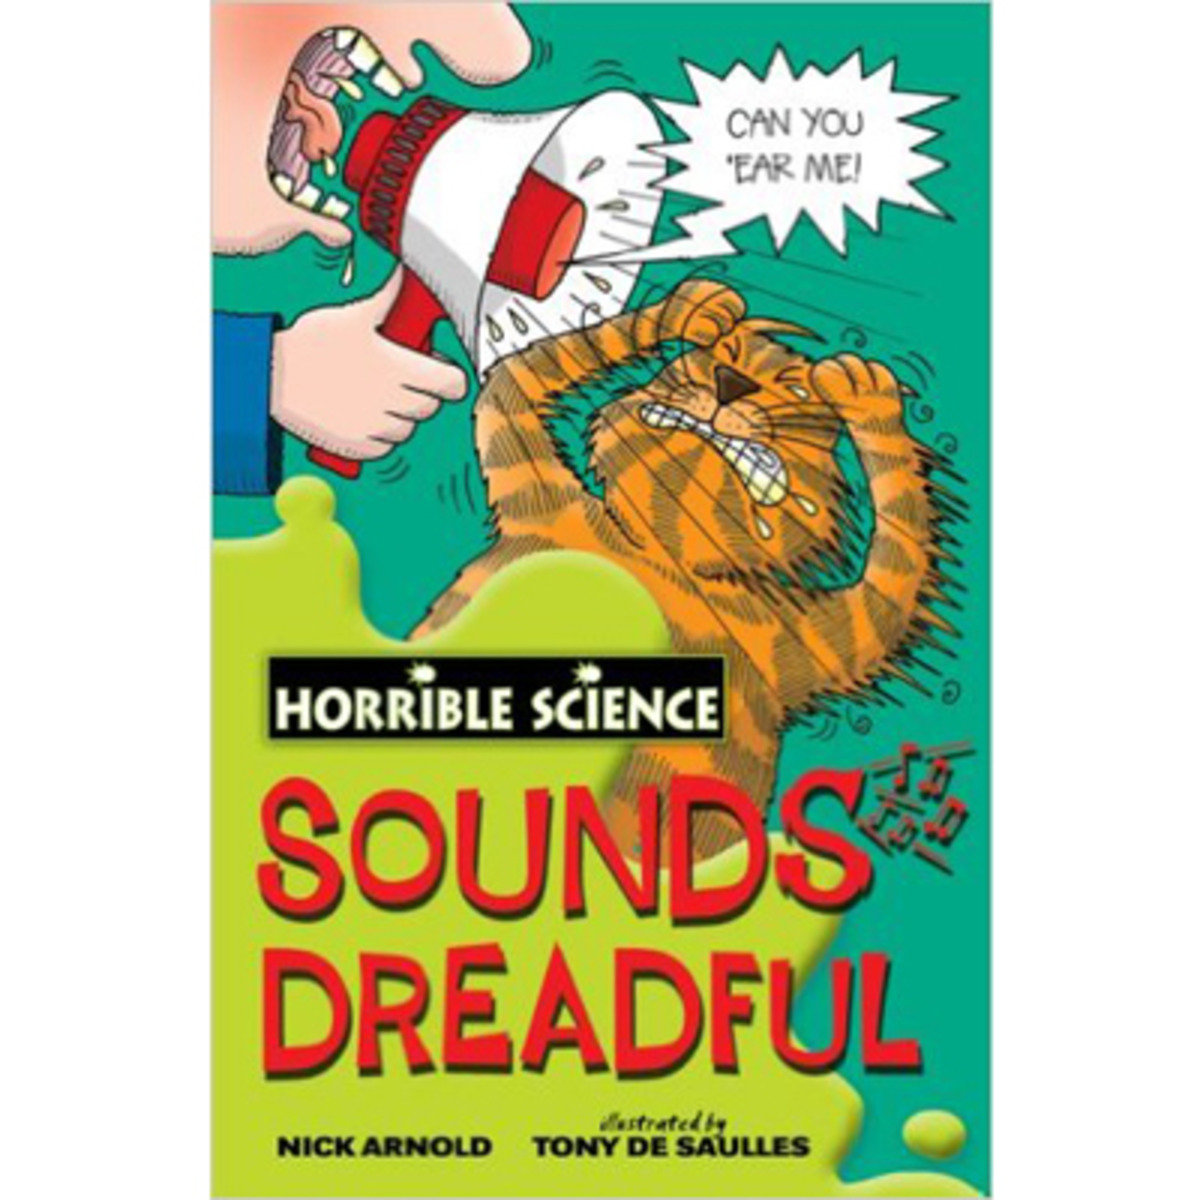 HORRIBLE SCIENCE: SOUNDS DREADFUL 9781407106106